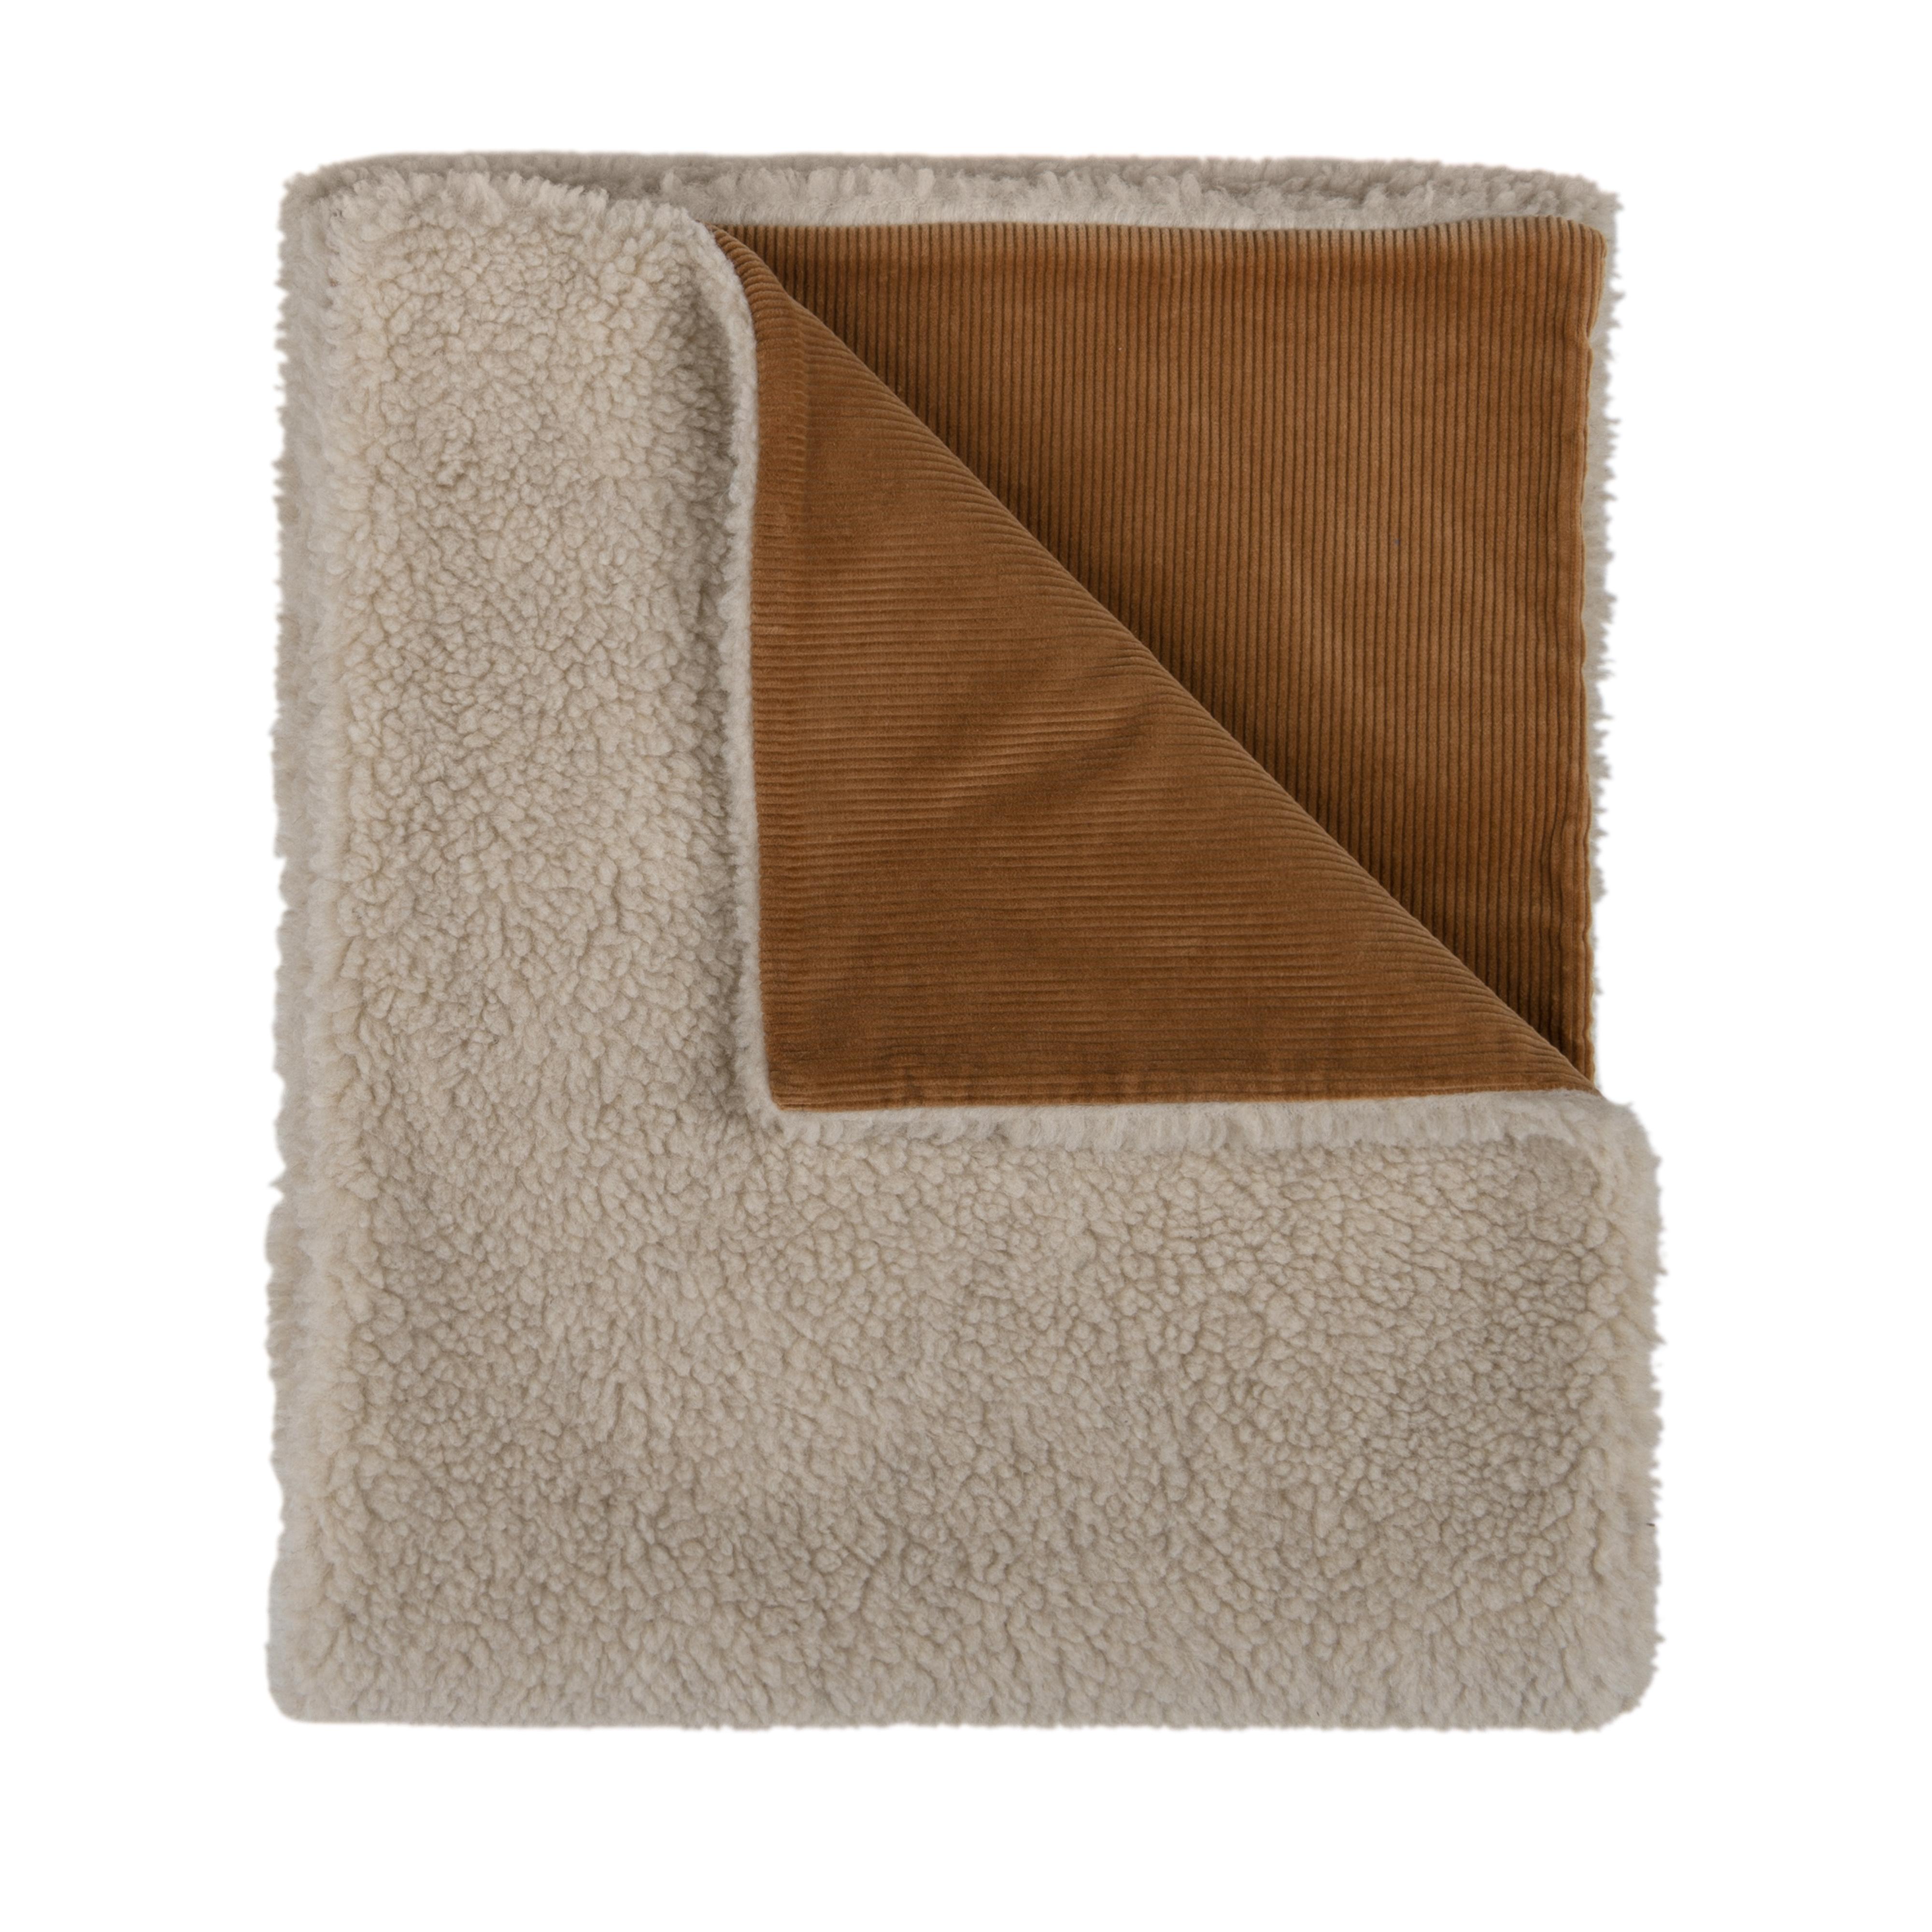 Corduroy Wool Scarf Brown White